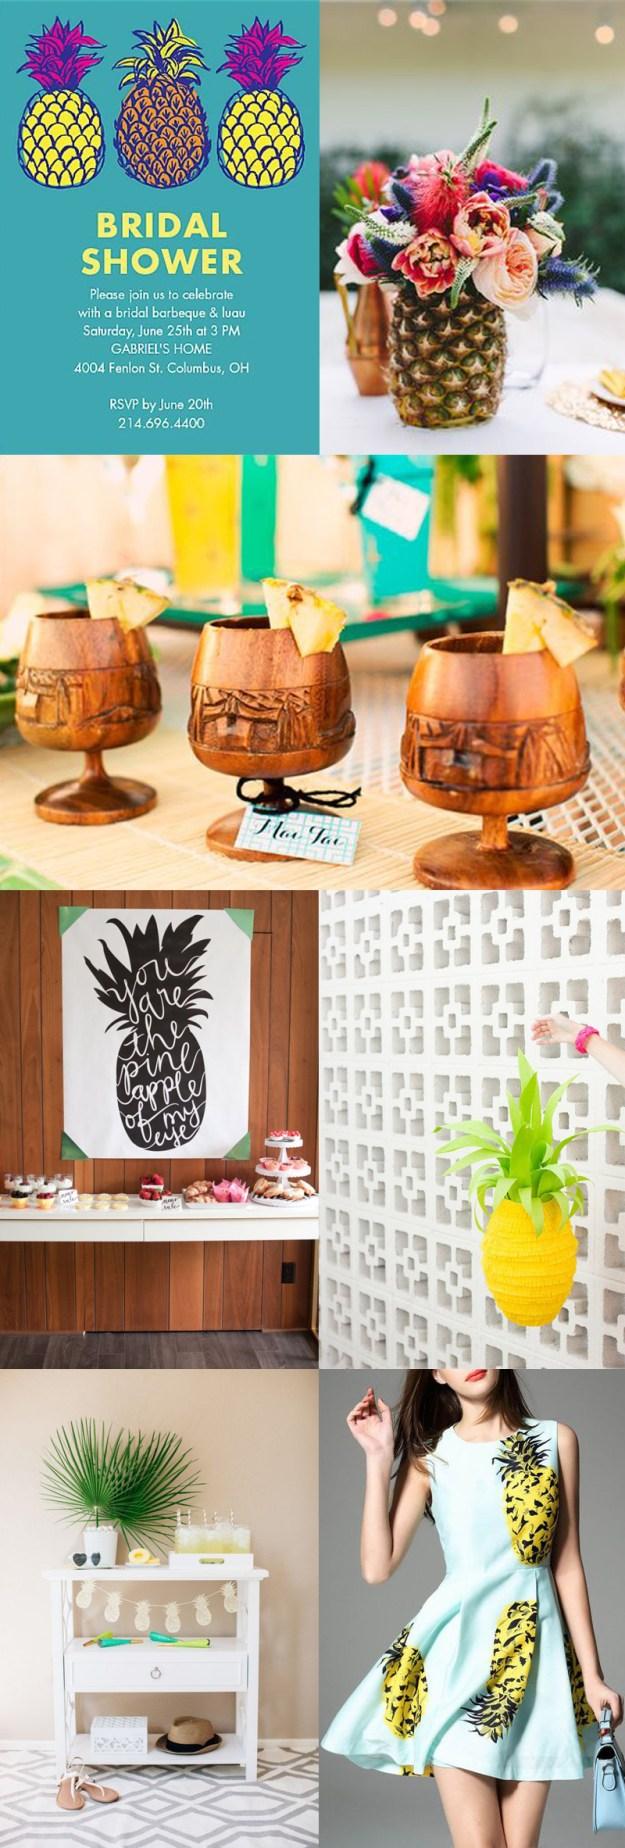 Pineapple bridal shower inspiration board